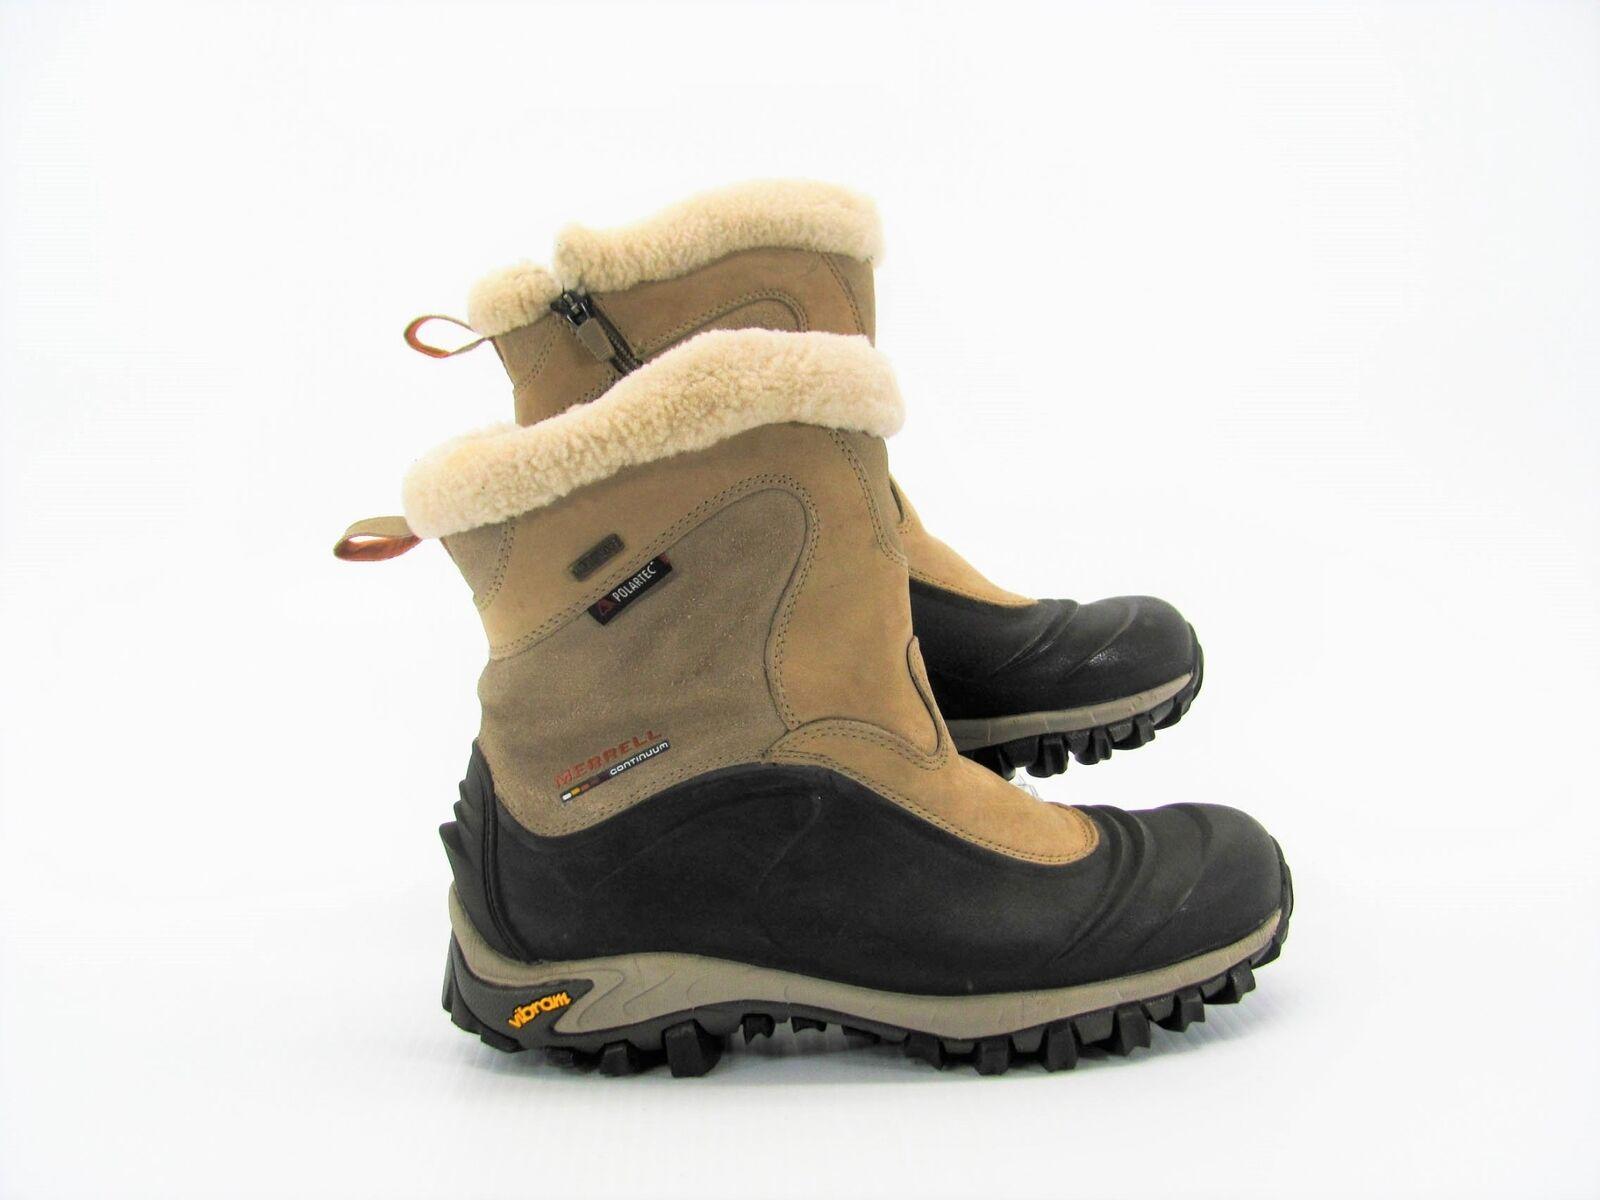 Merrell Continuum Women Tan Brown Waterproof Boot shoes US 9M Pre Owned UI